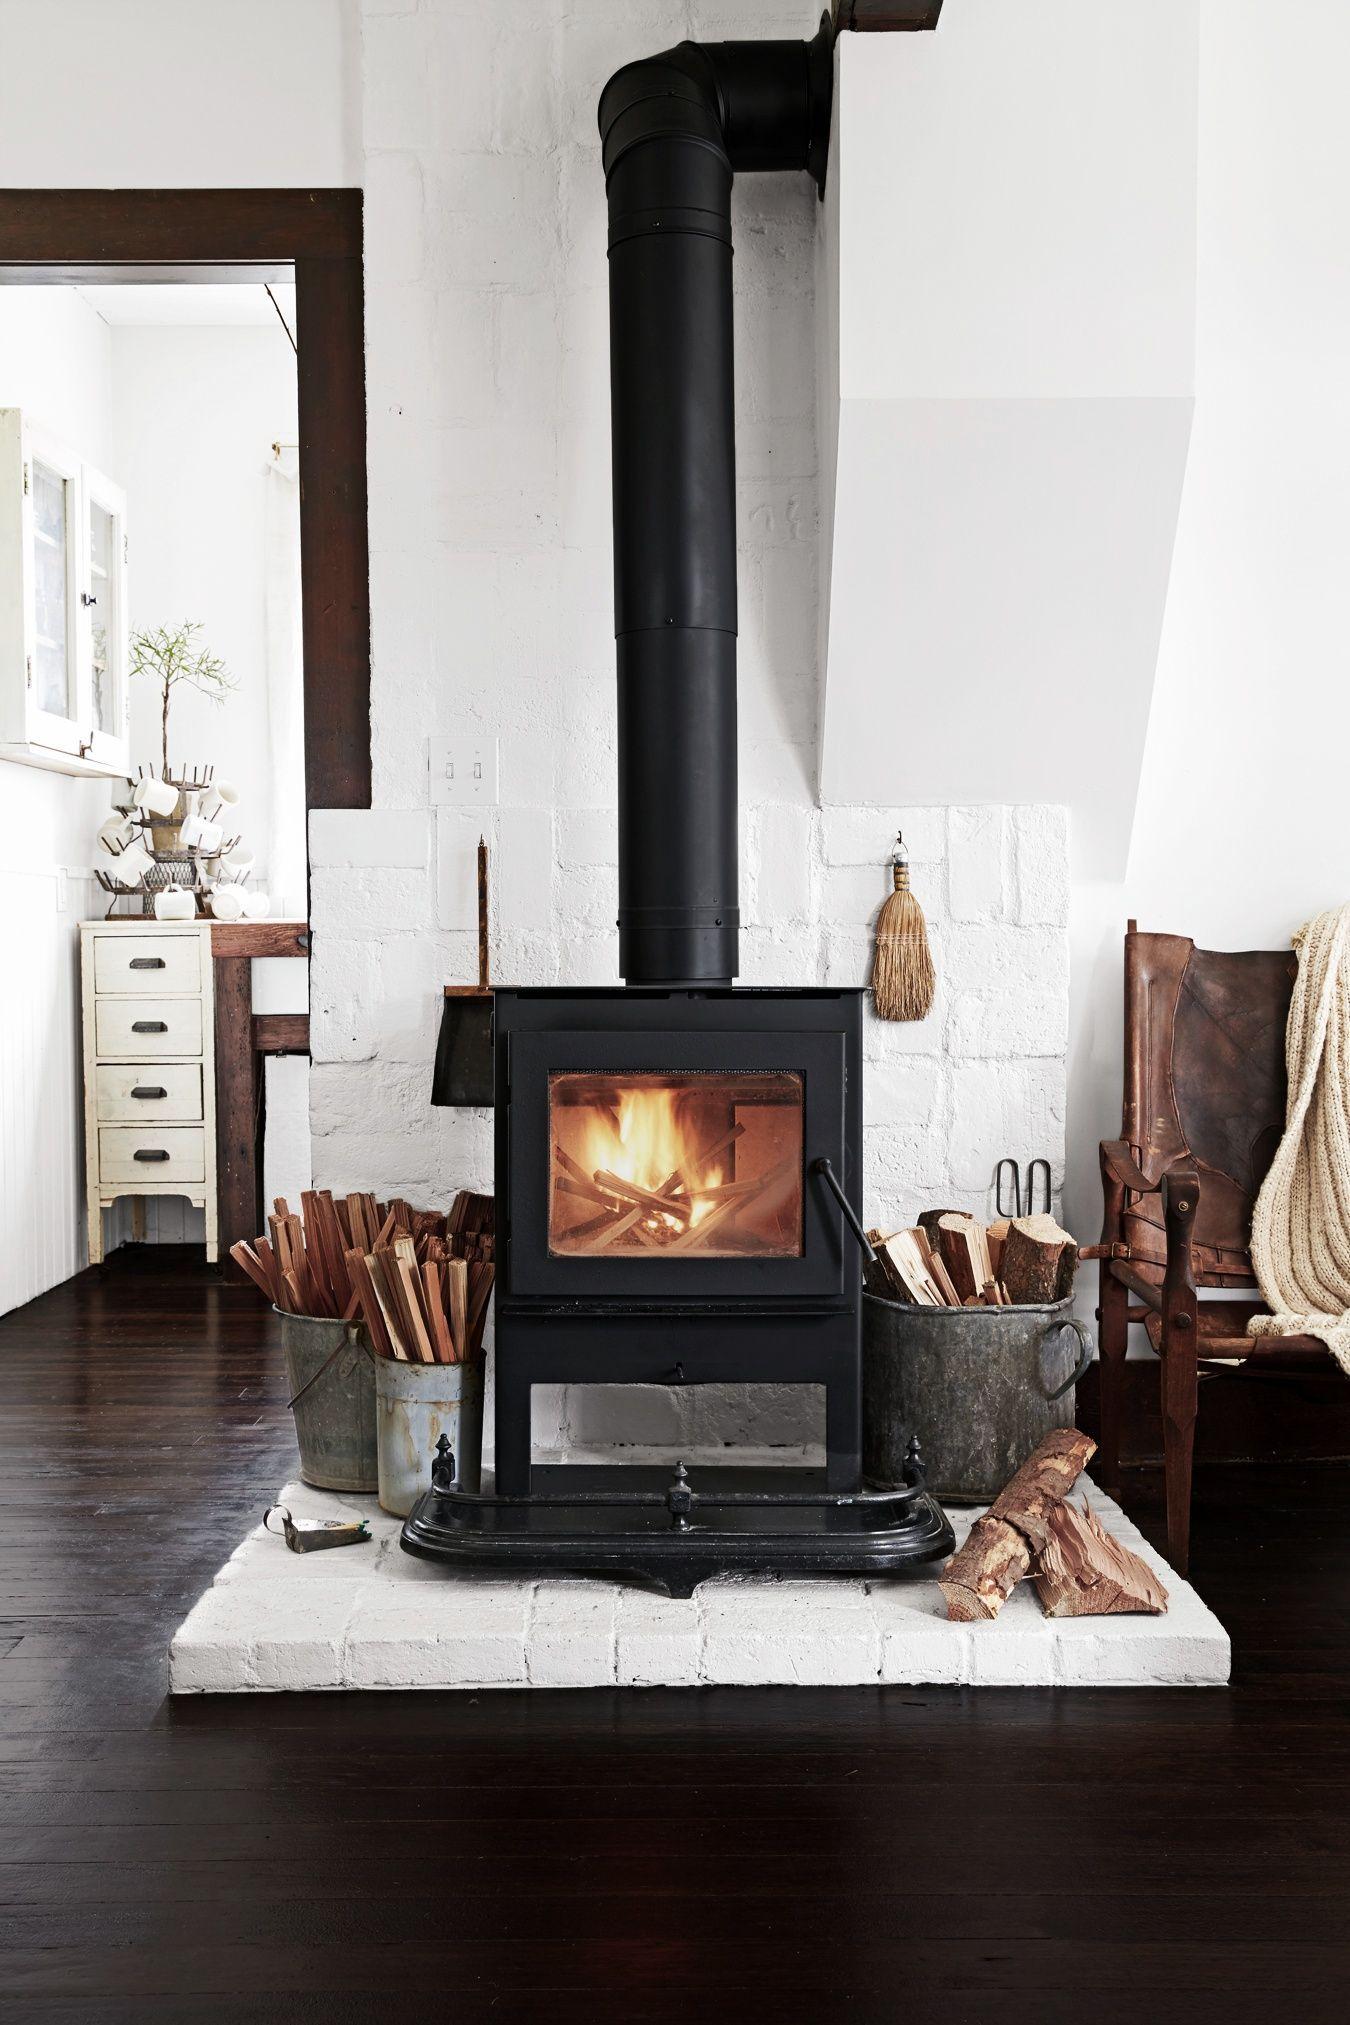 Wood Stove Living Room Design Wood Burning Stove With White Brick